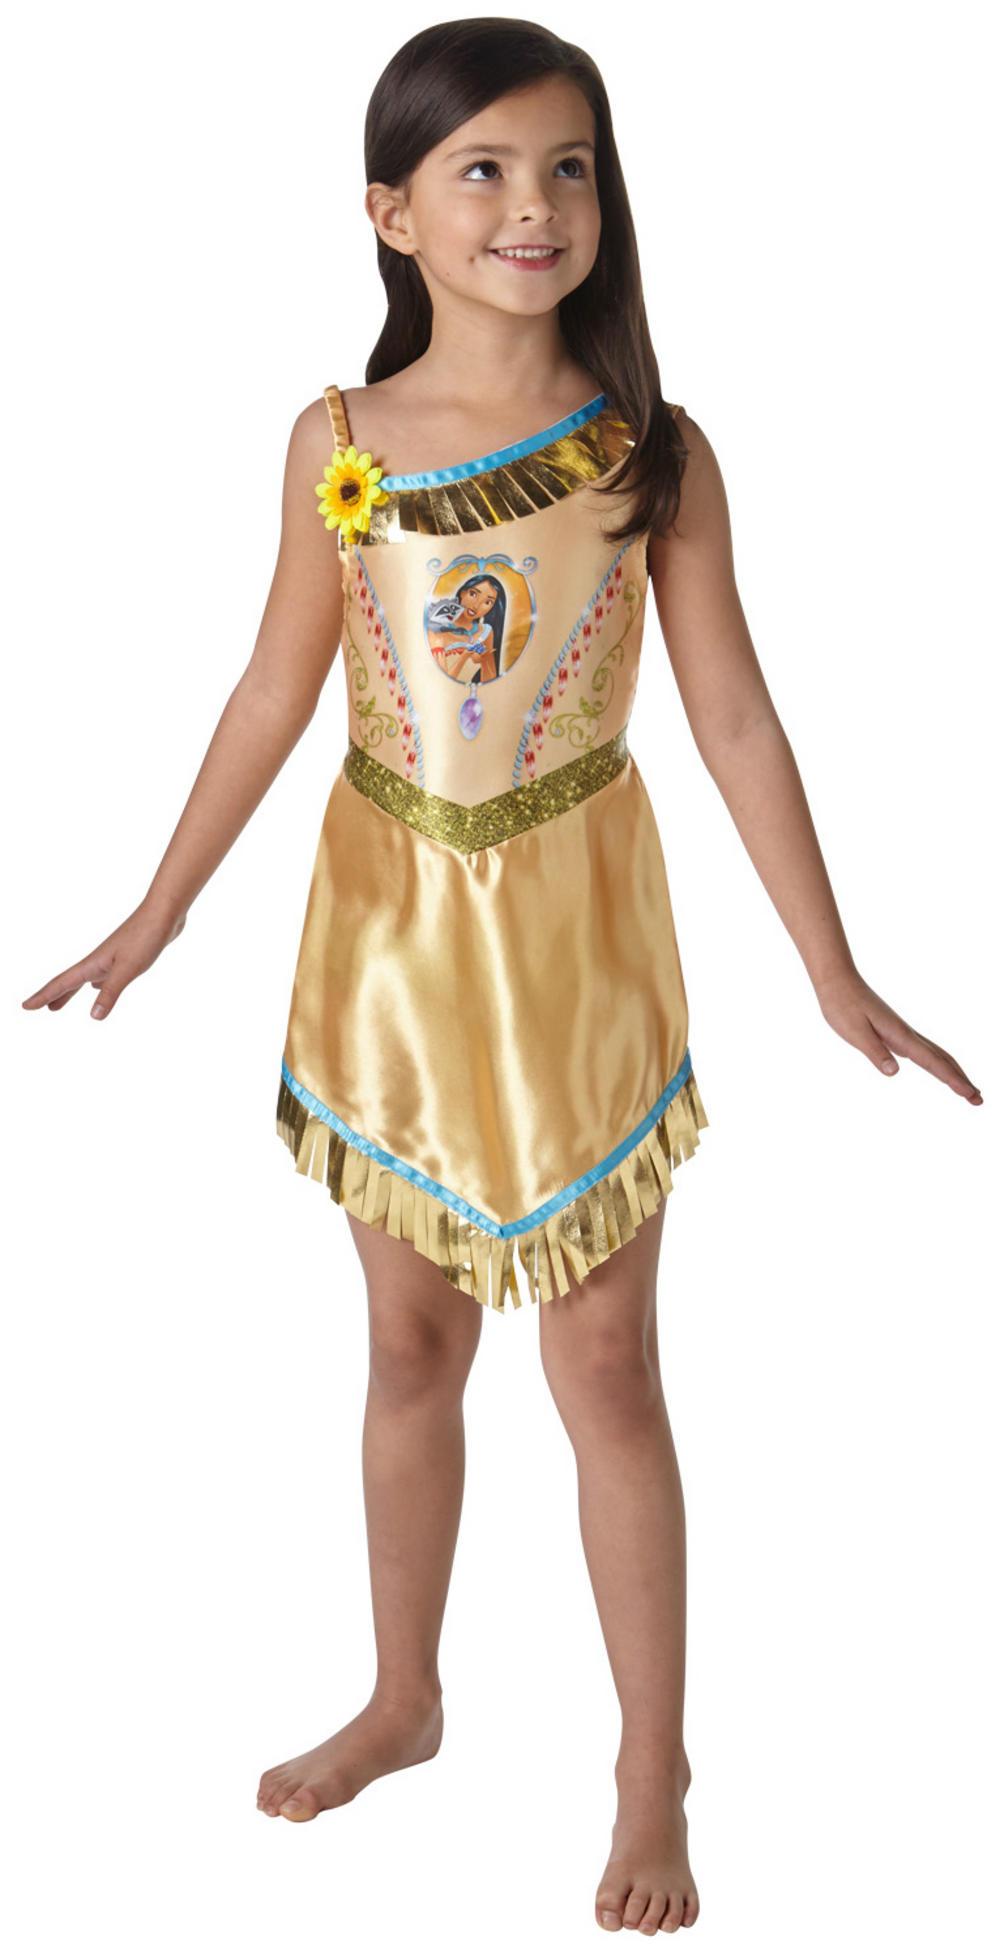 Fairytale Pocahontas Girls Costume